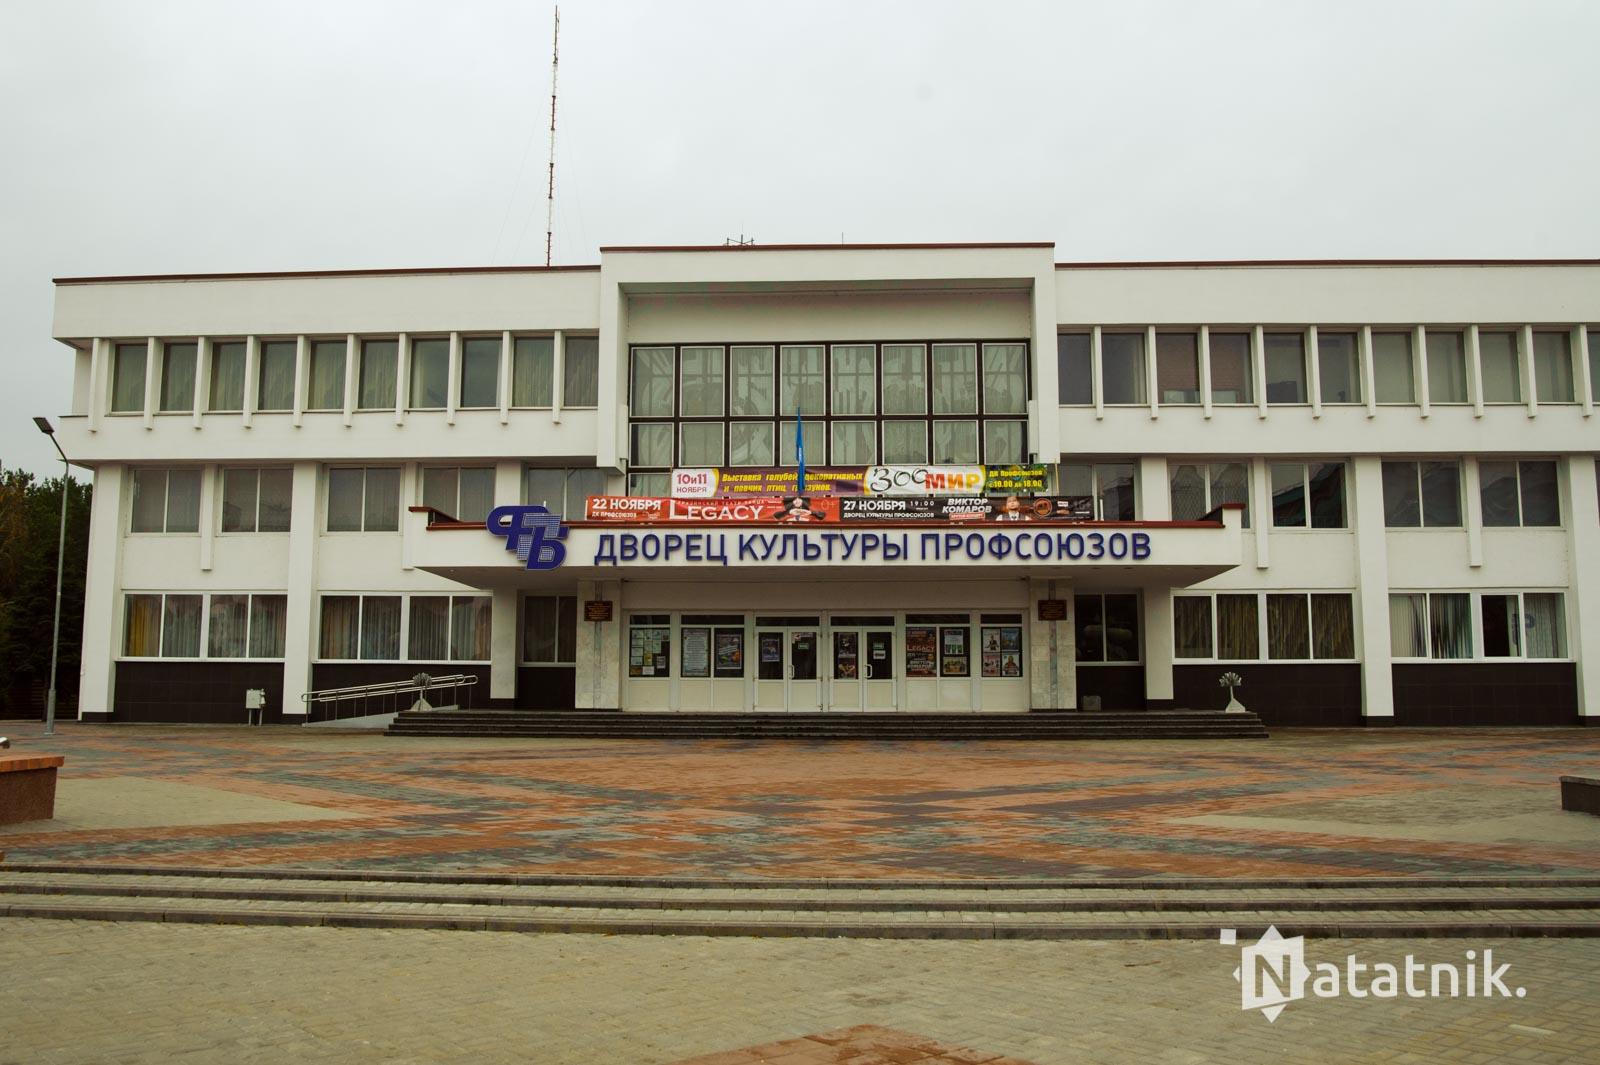 Дворец культуры профсоюзов, Брест